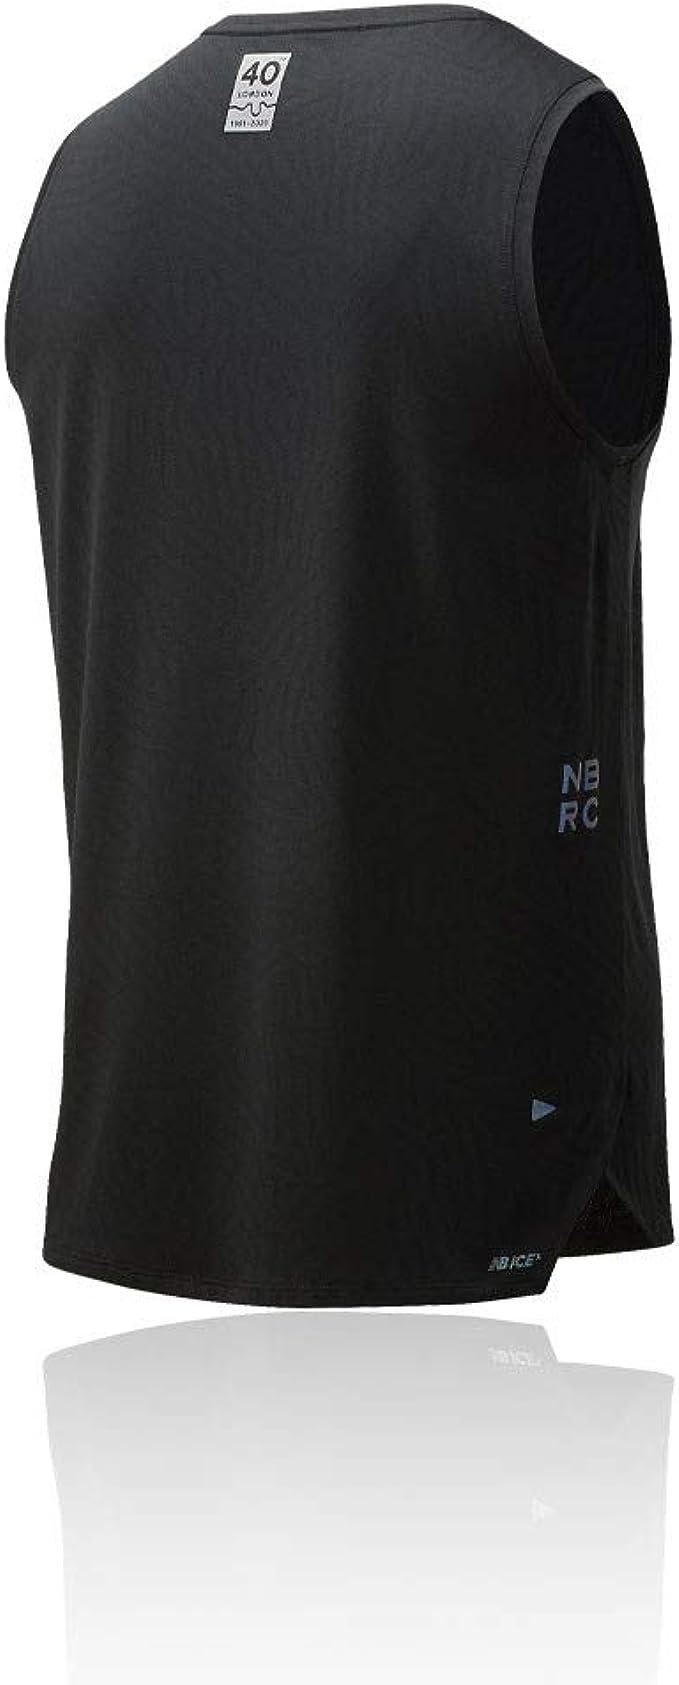 New Balance Mens Q Speed Jacquard Running Vest Black Sports Breathable